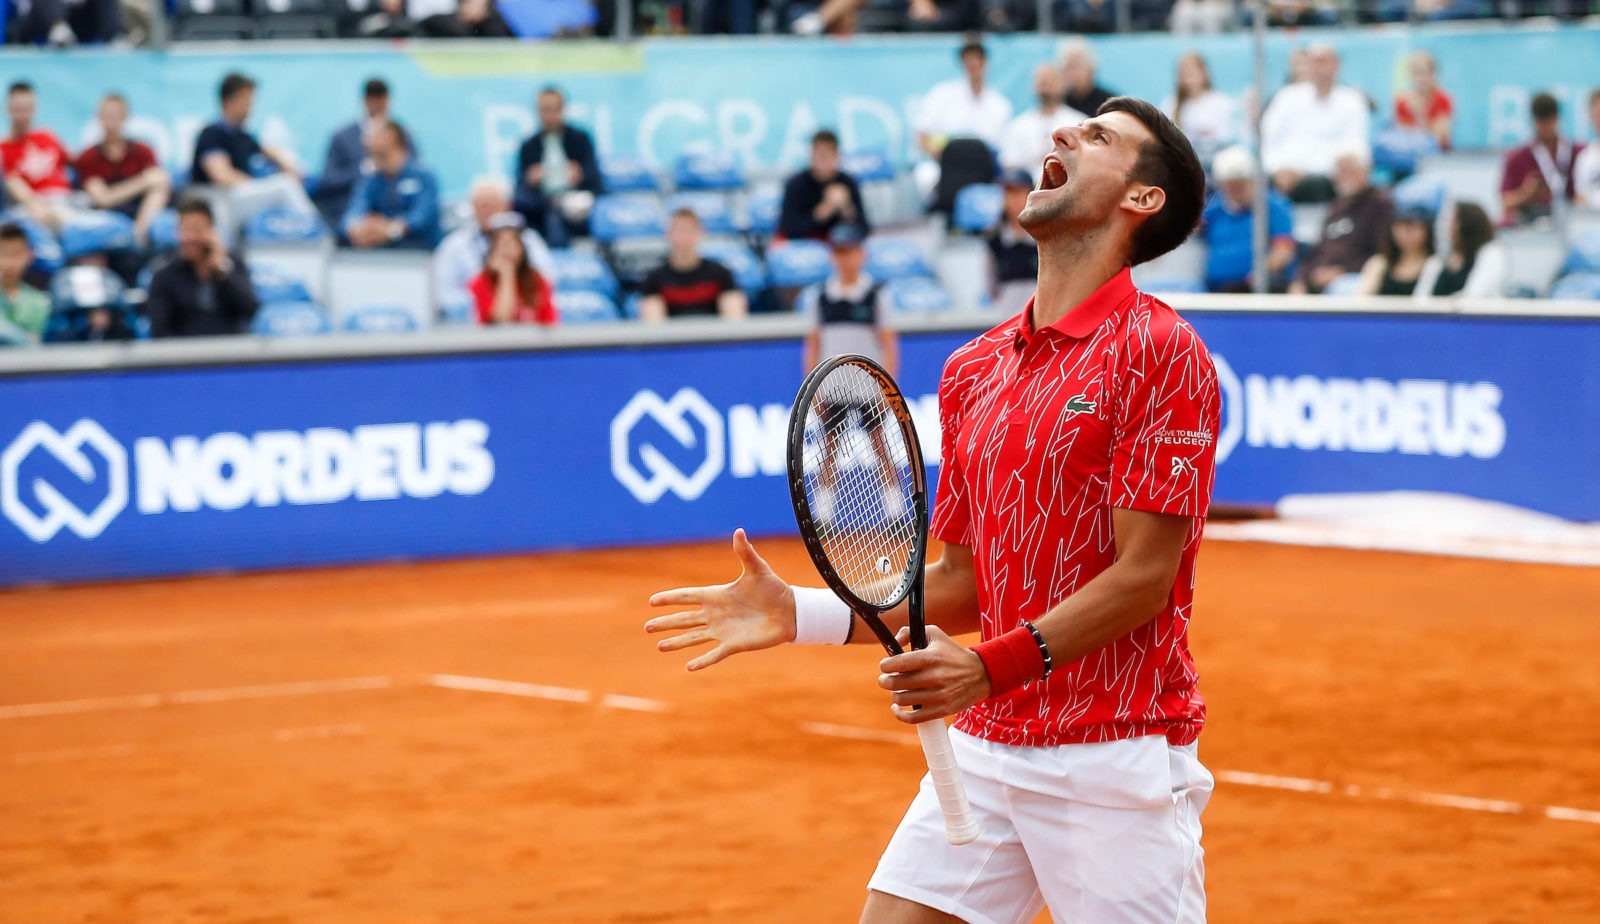 Novak Djokovic (fot. Adria Tour)